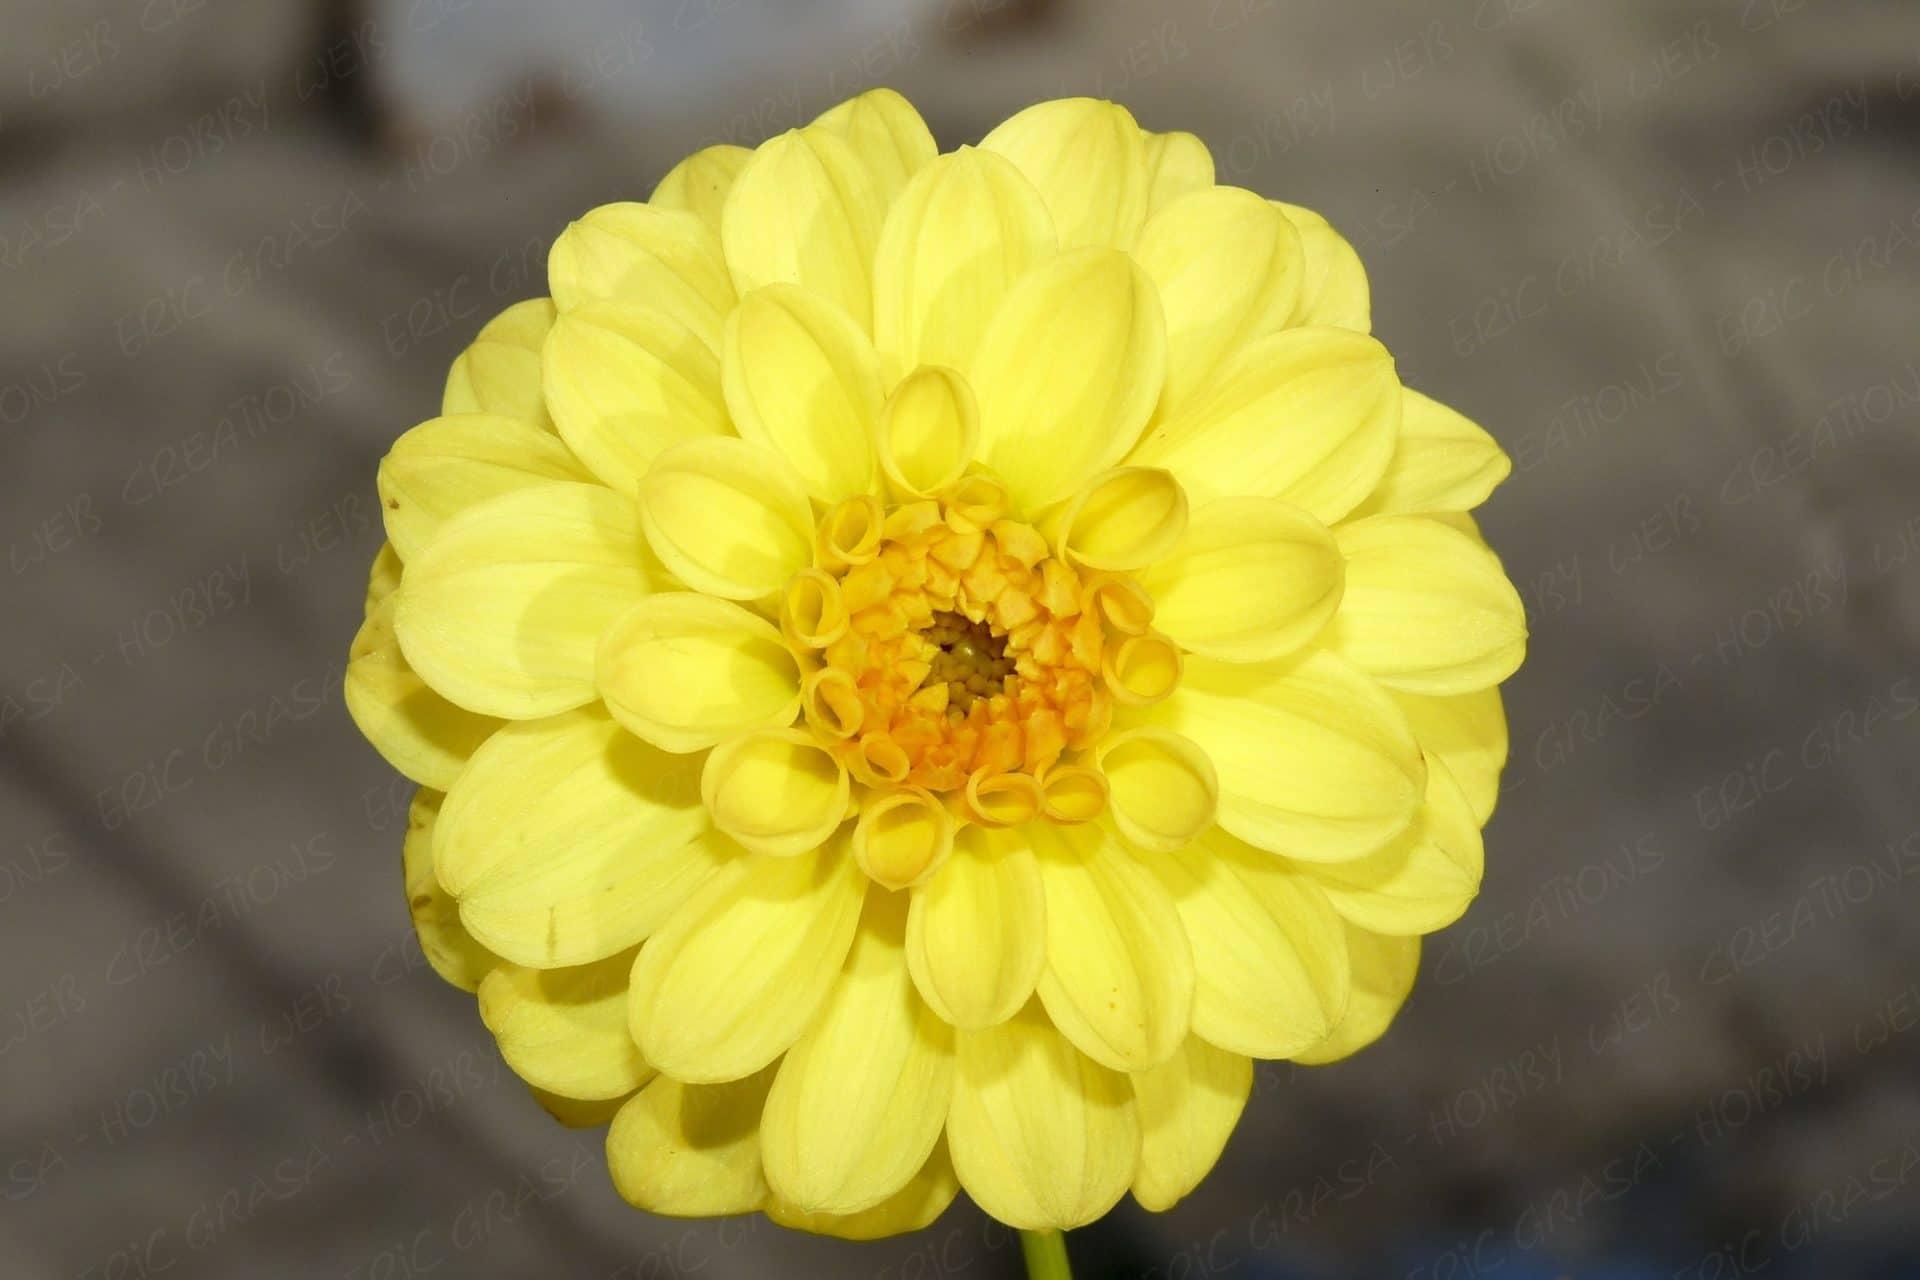 Fleurs au 23-11-2014